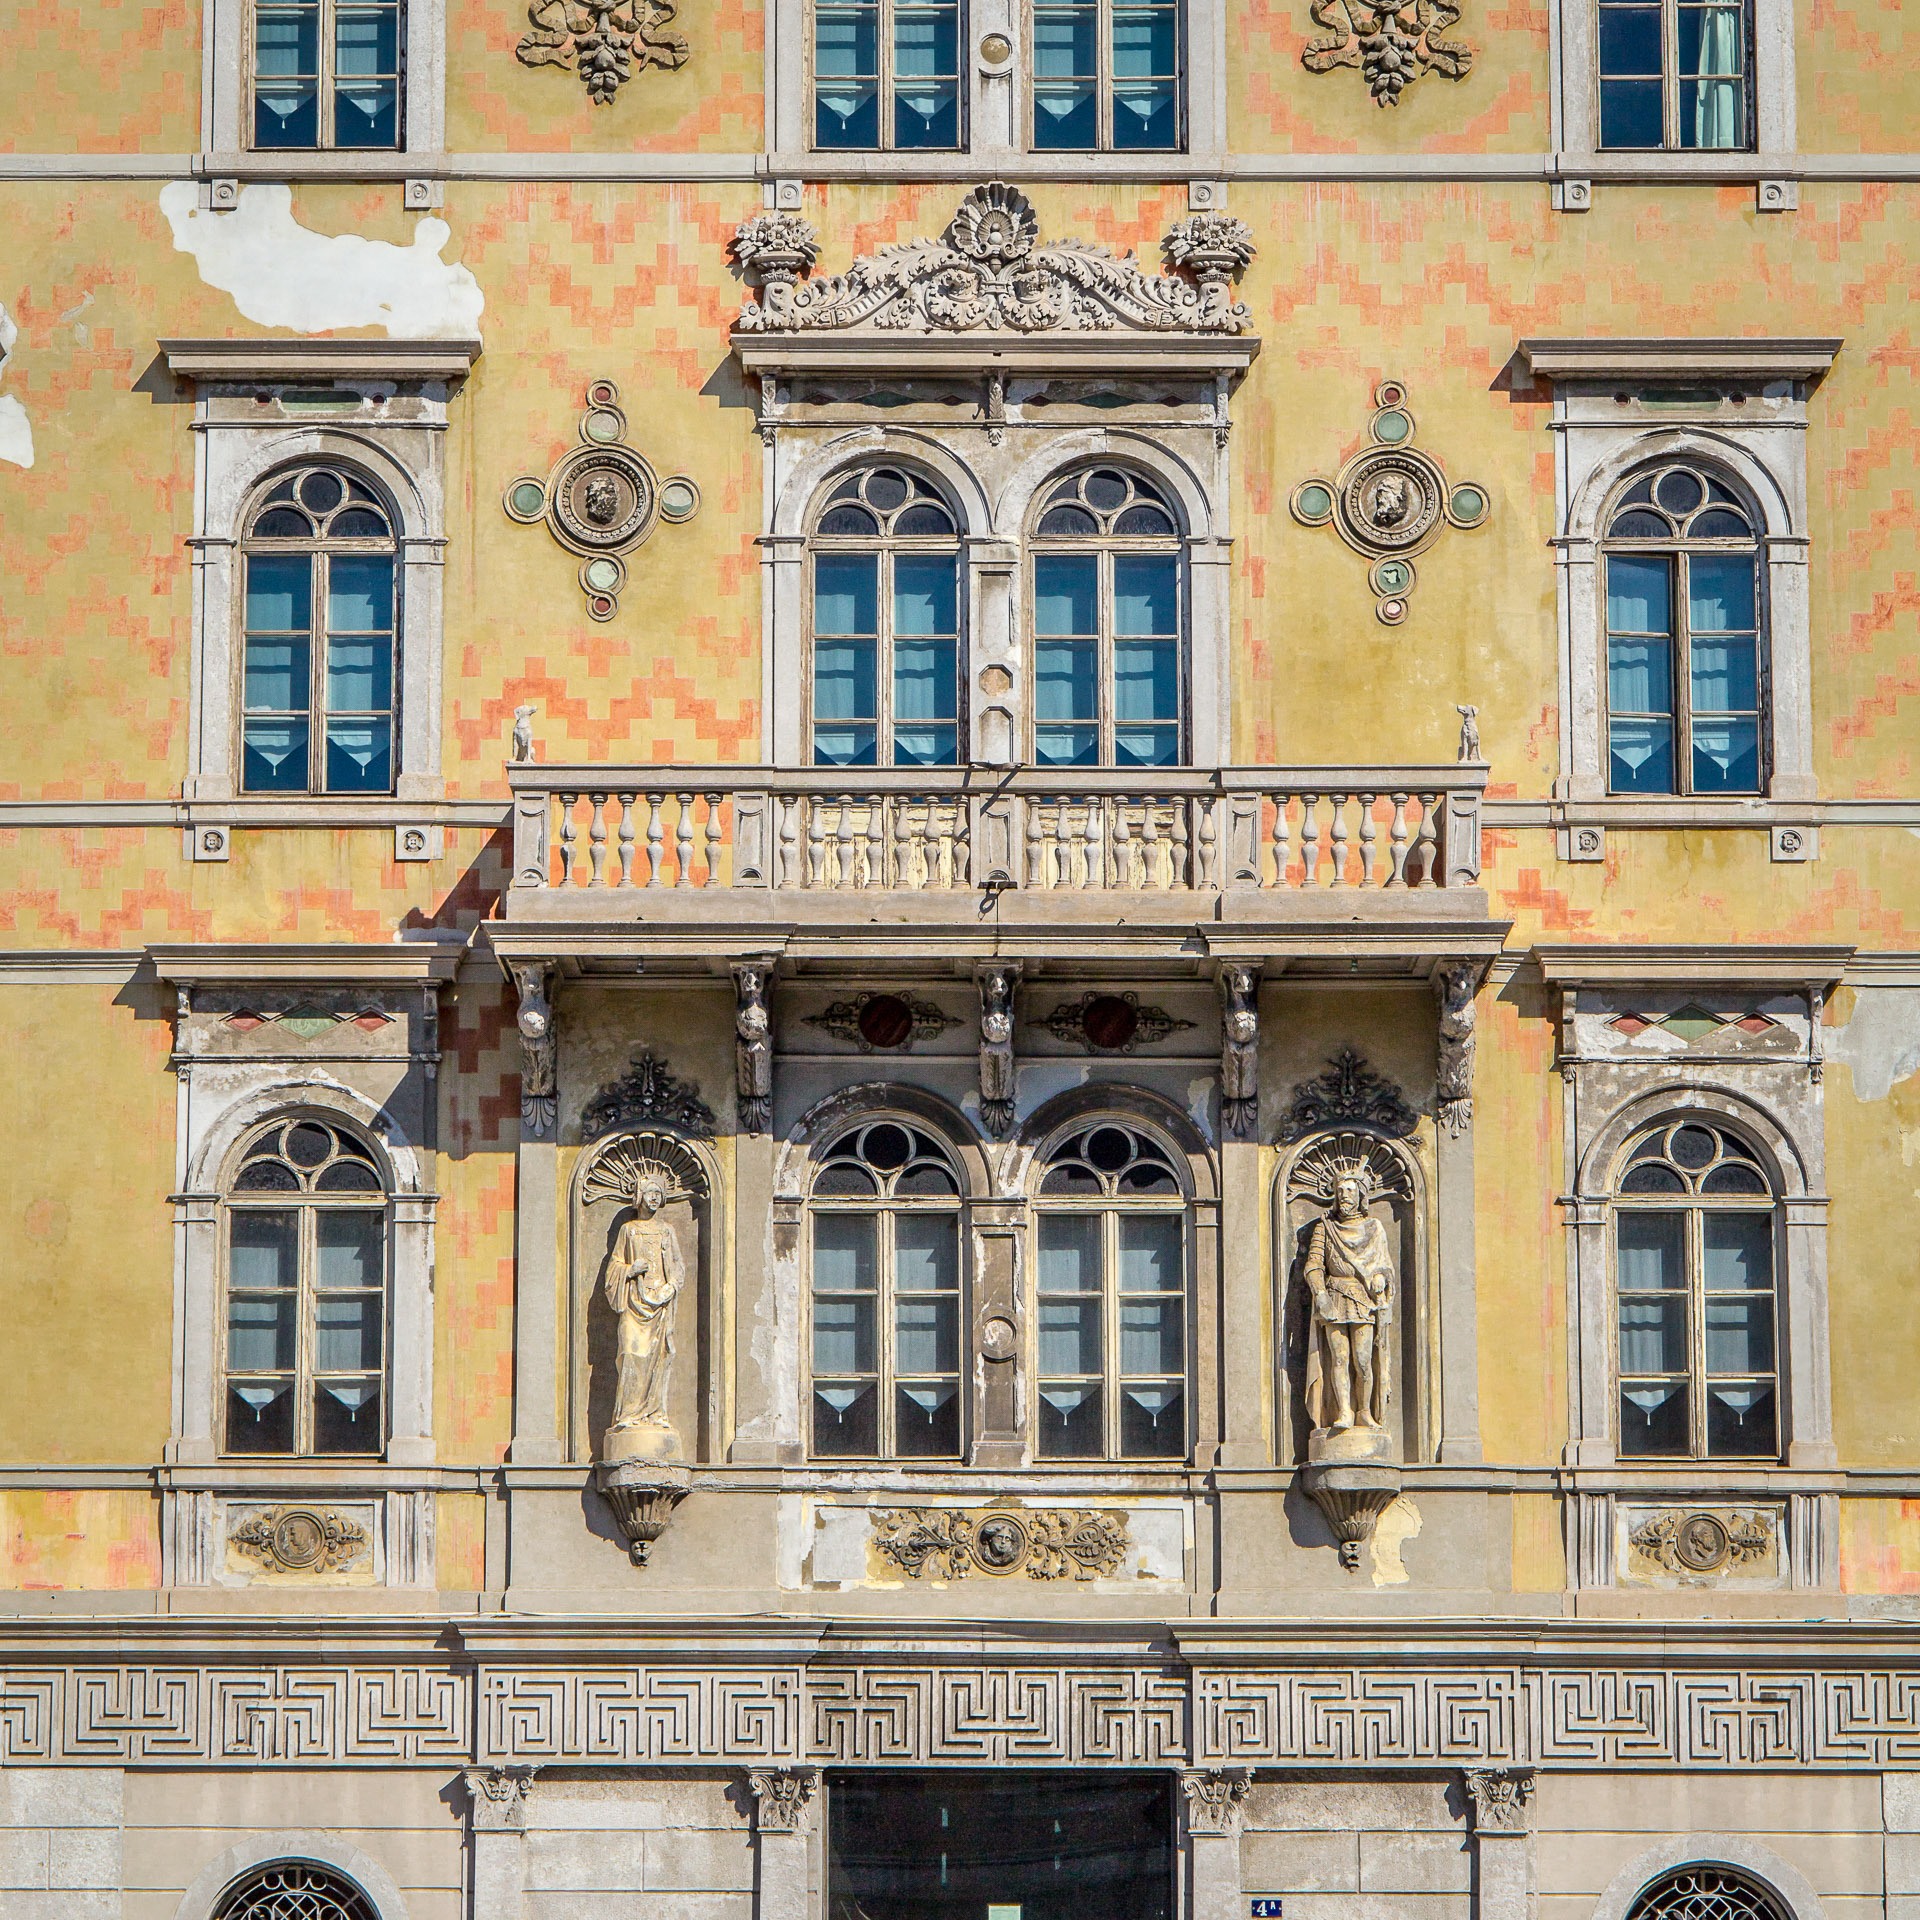 Fassade des Civico Museo Teatrale Carlo Schmidl